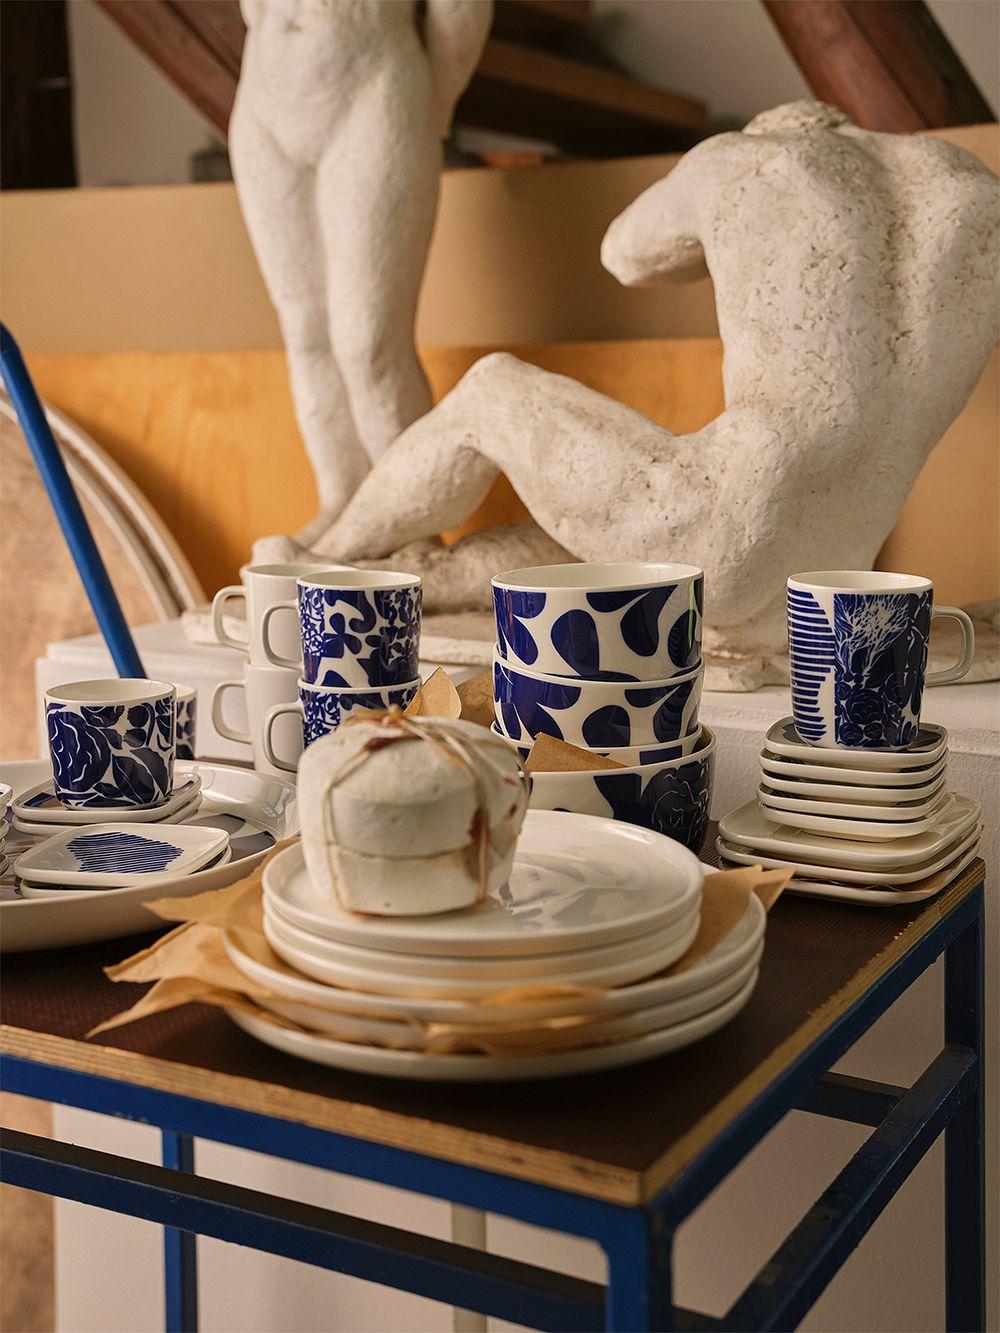 https://www.finnishdesignshop.com/tableware-dishware-bowls-oiva-ruudut-bowl-white-blue-p-33514.html